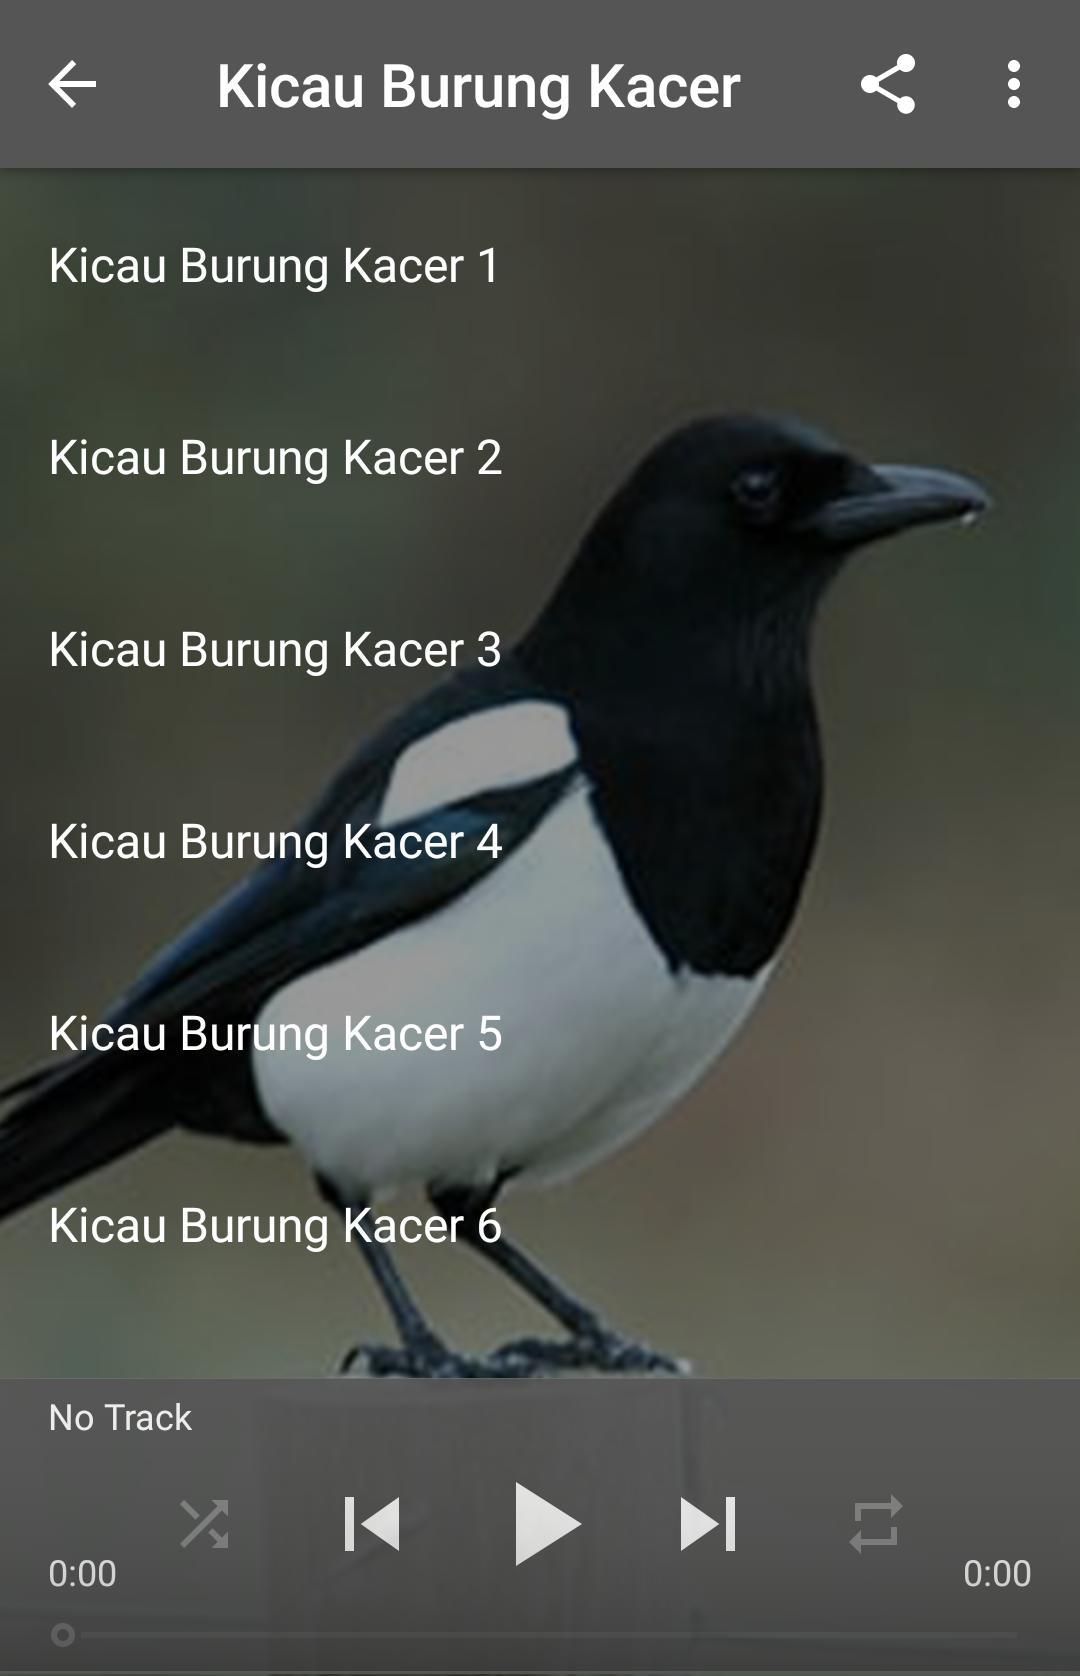 Kicau Burung Kacer For Android Apk Download